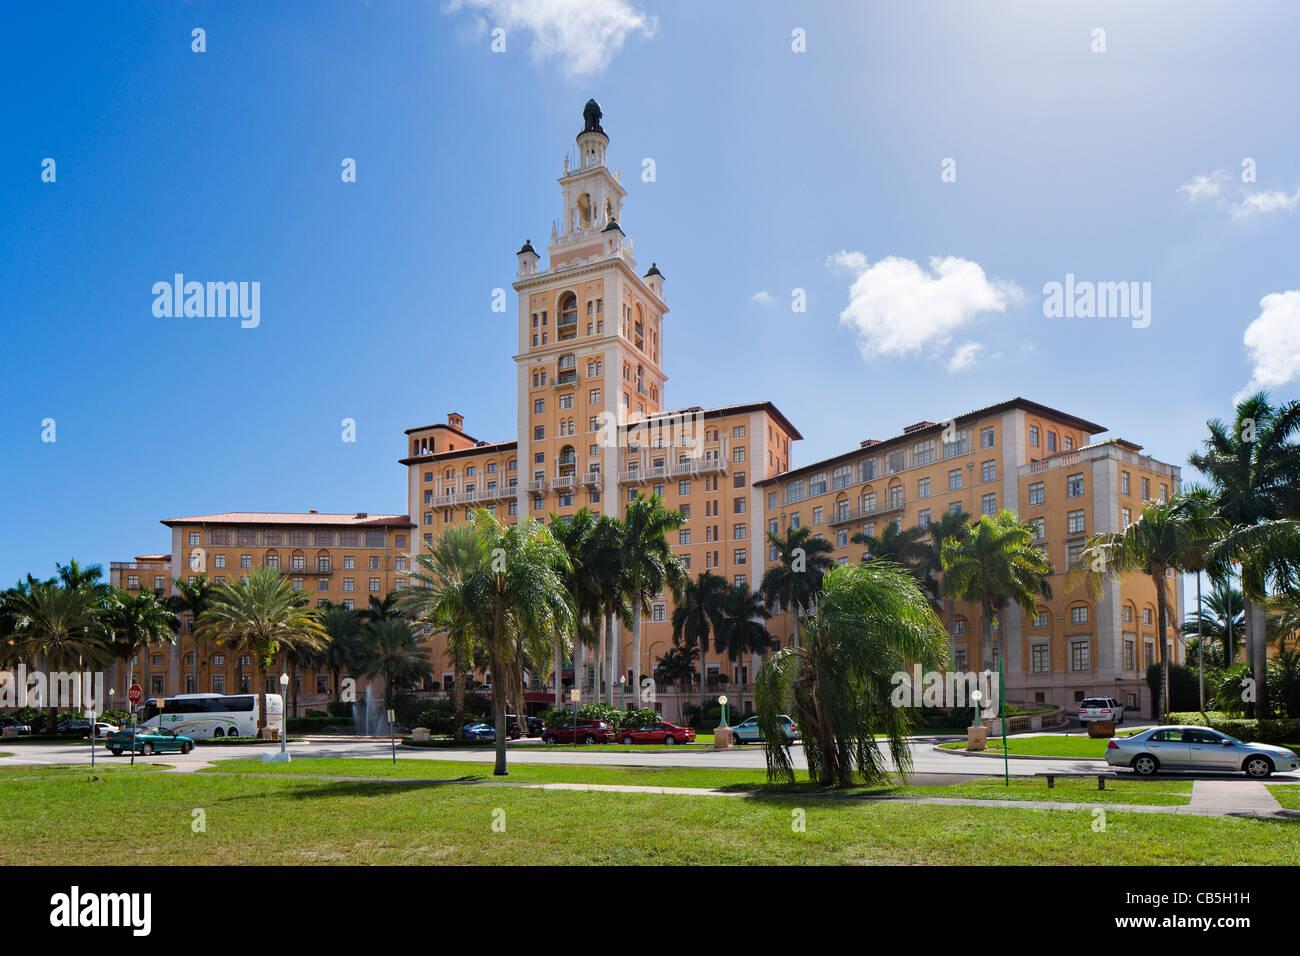 The Biltmore Hotel, Coral Gables, Miami, Florida, USA - Stock Image